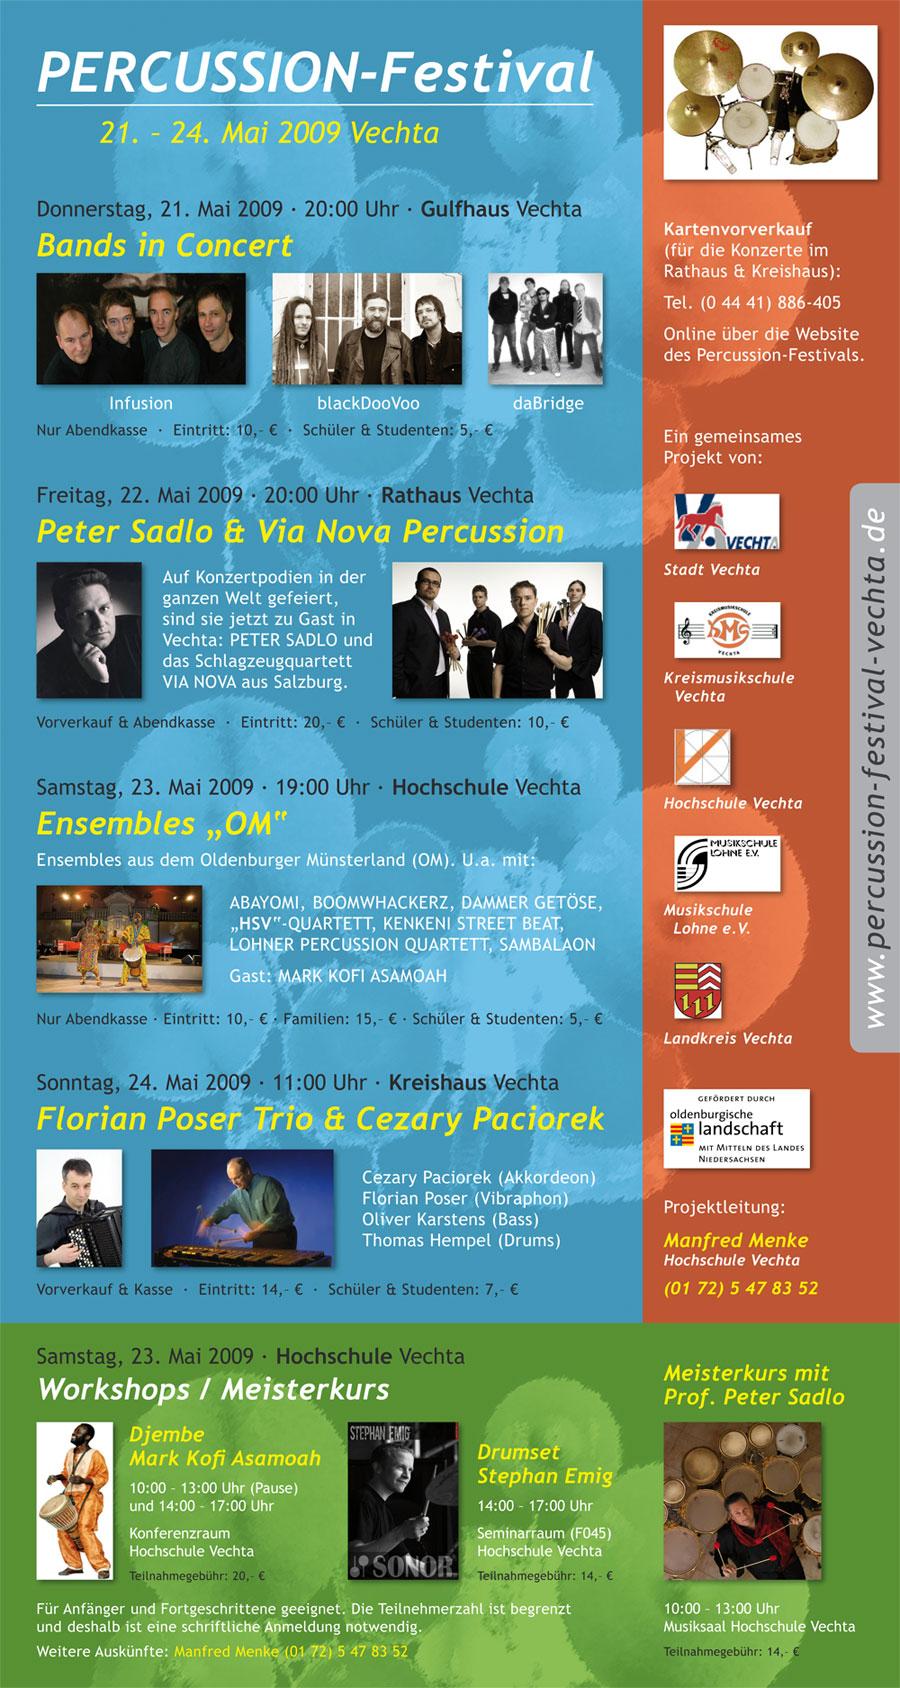 Percussion-Festival Vechta · Plakat 2009